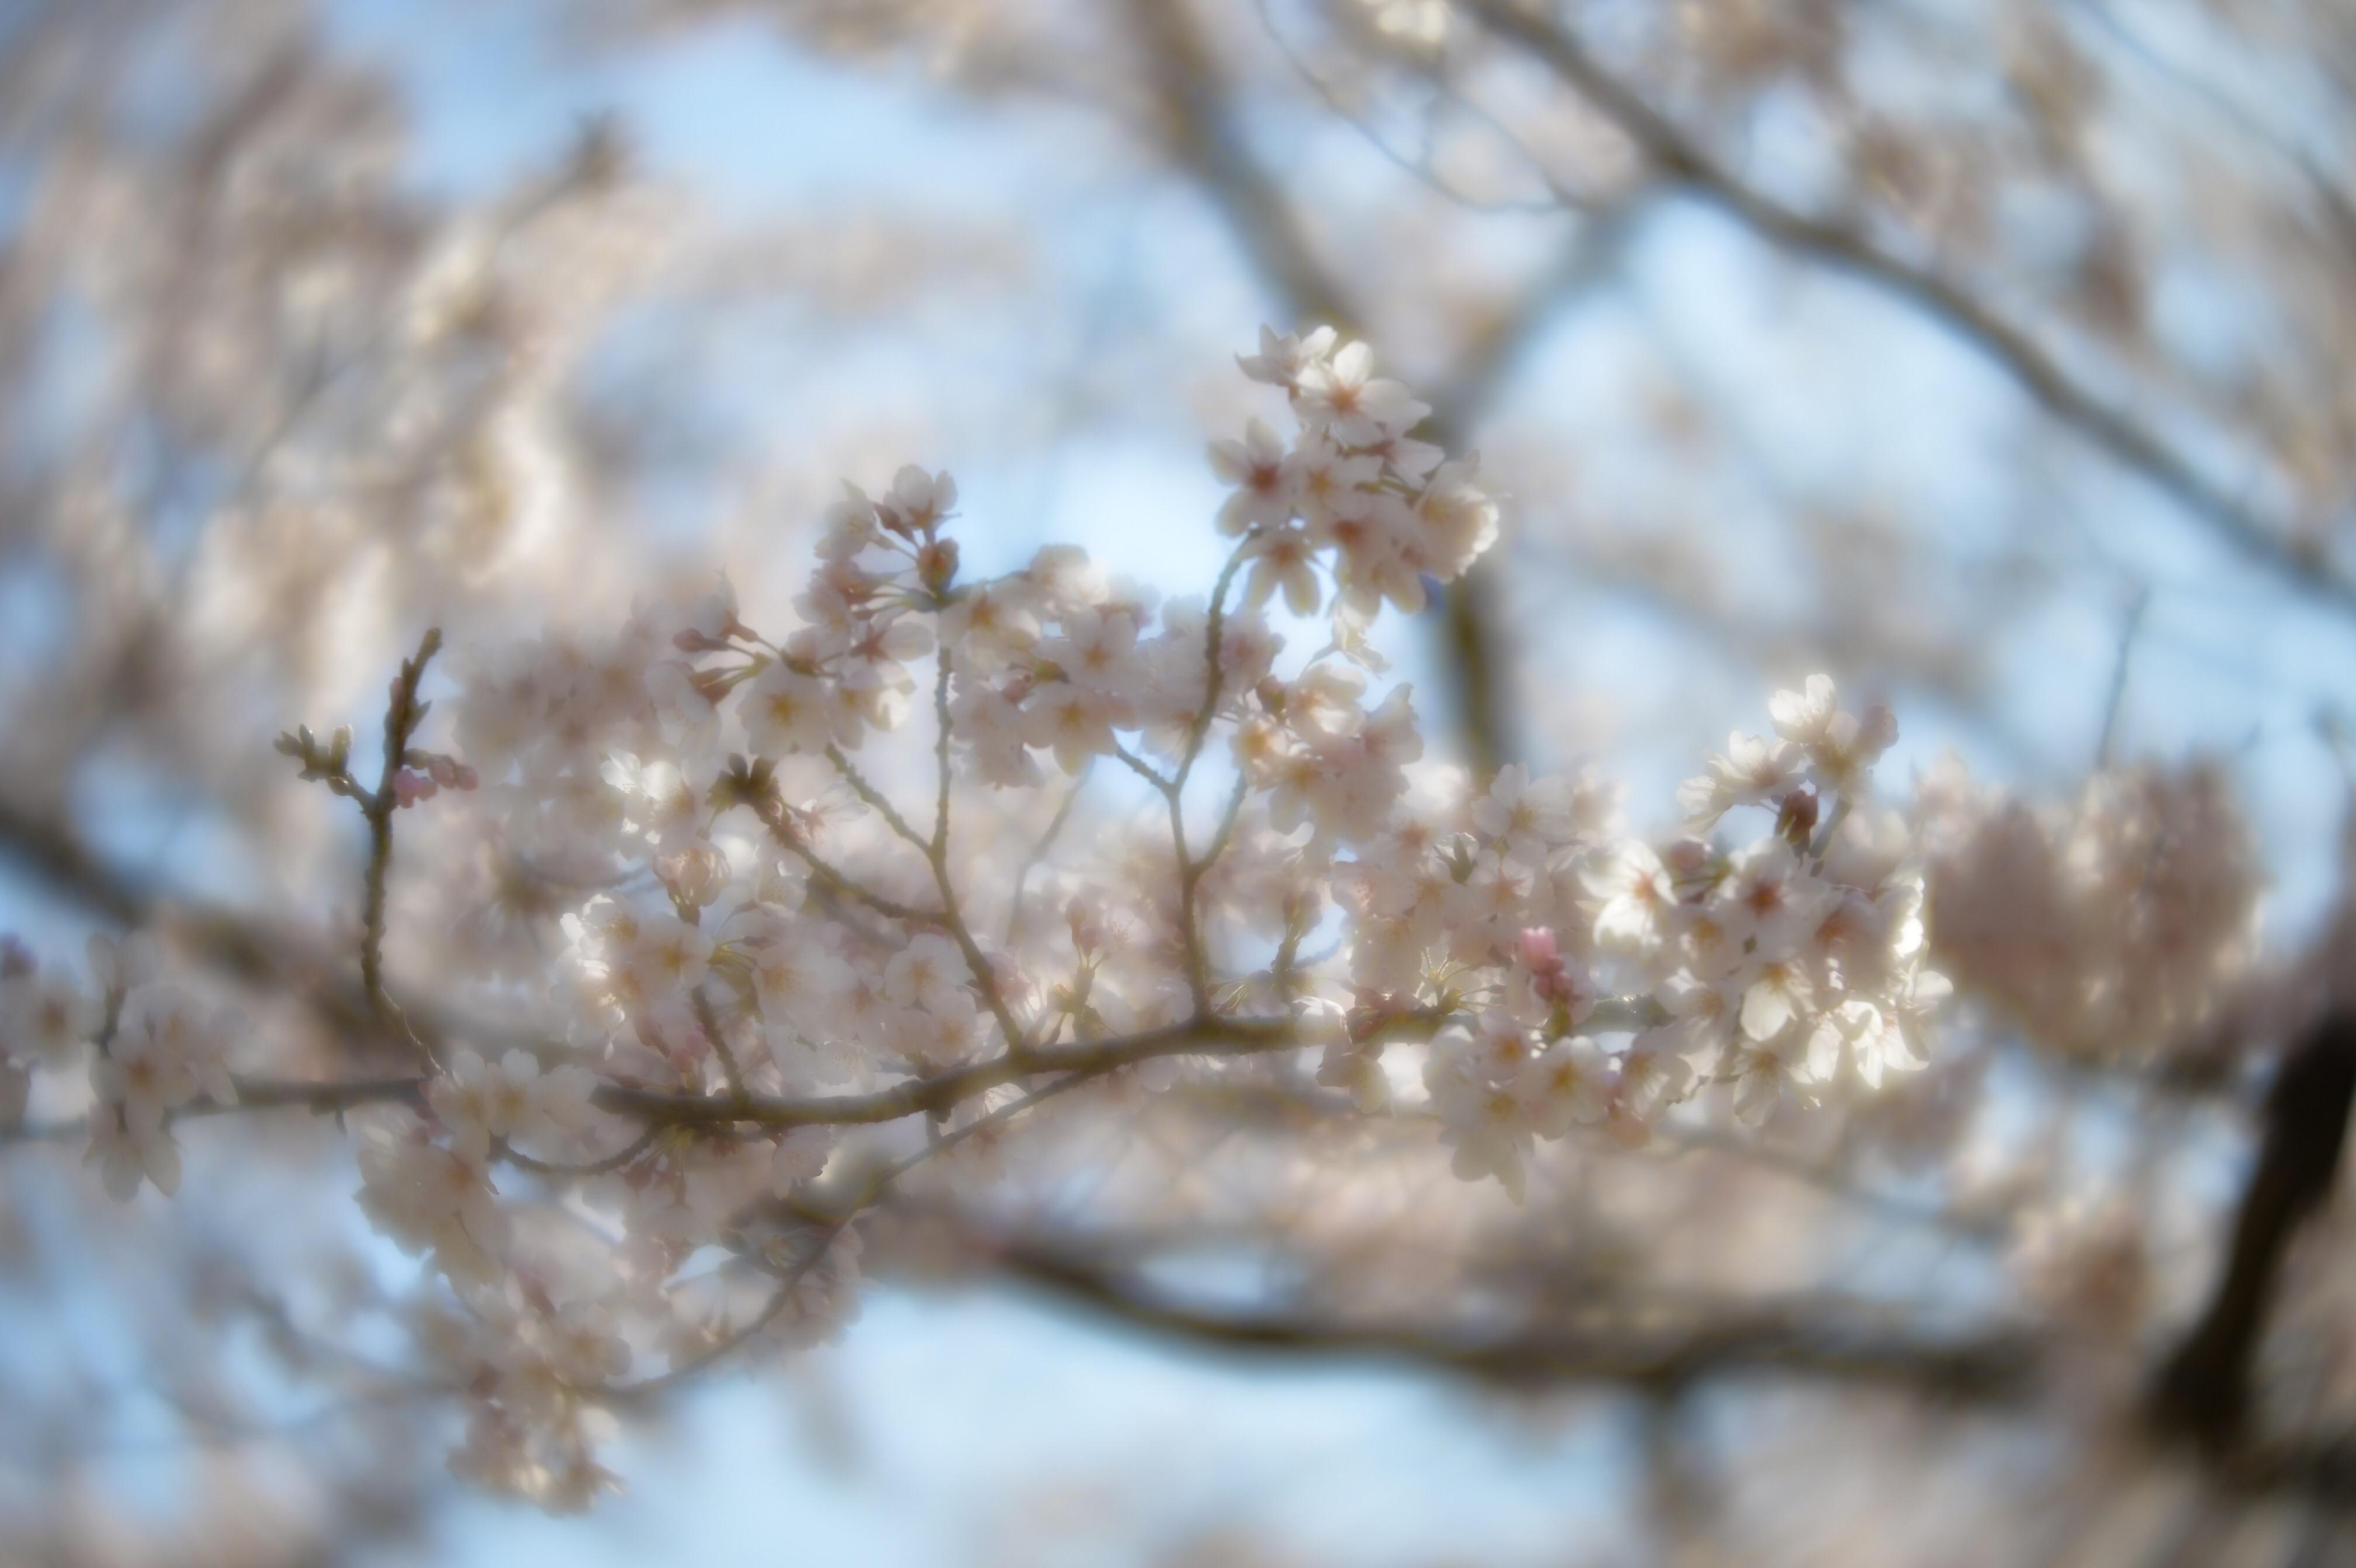 f:id:muramasachang:20210707014711j:image